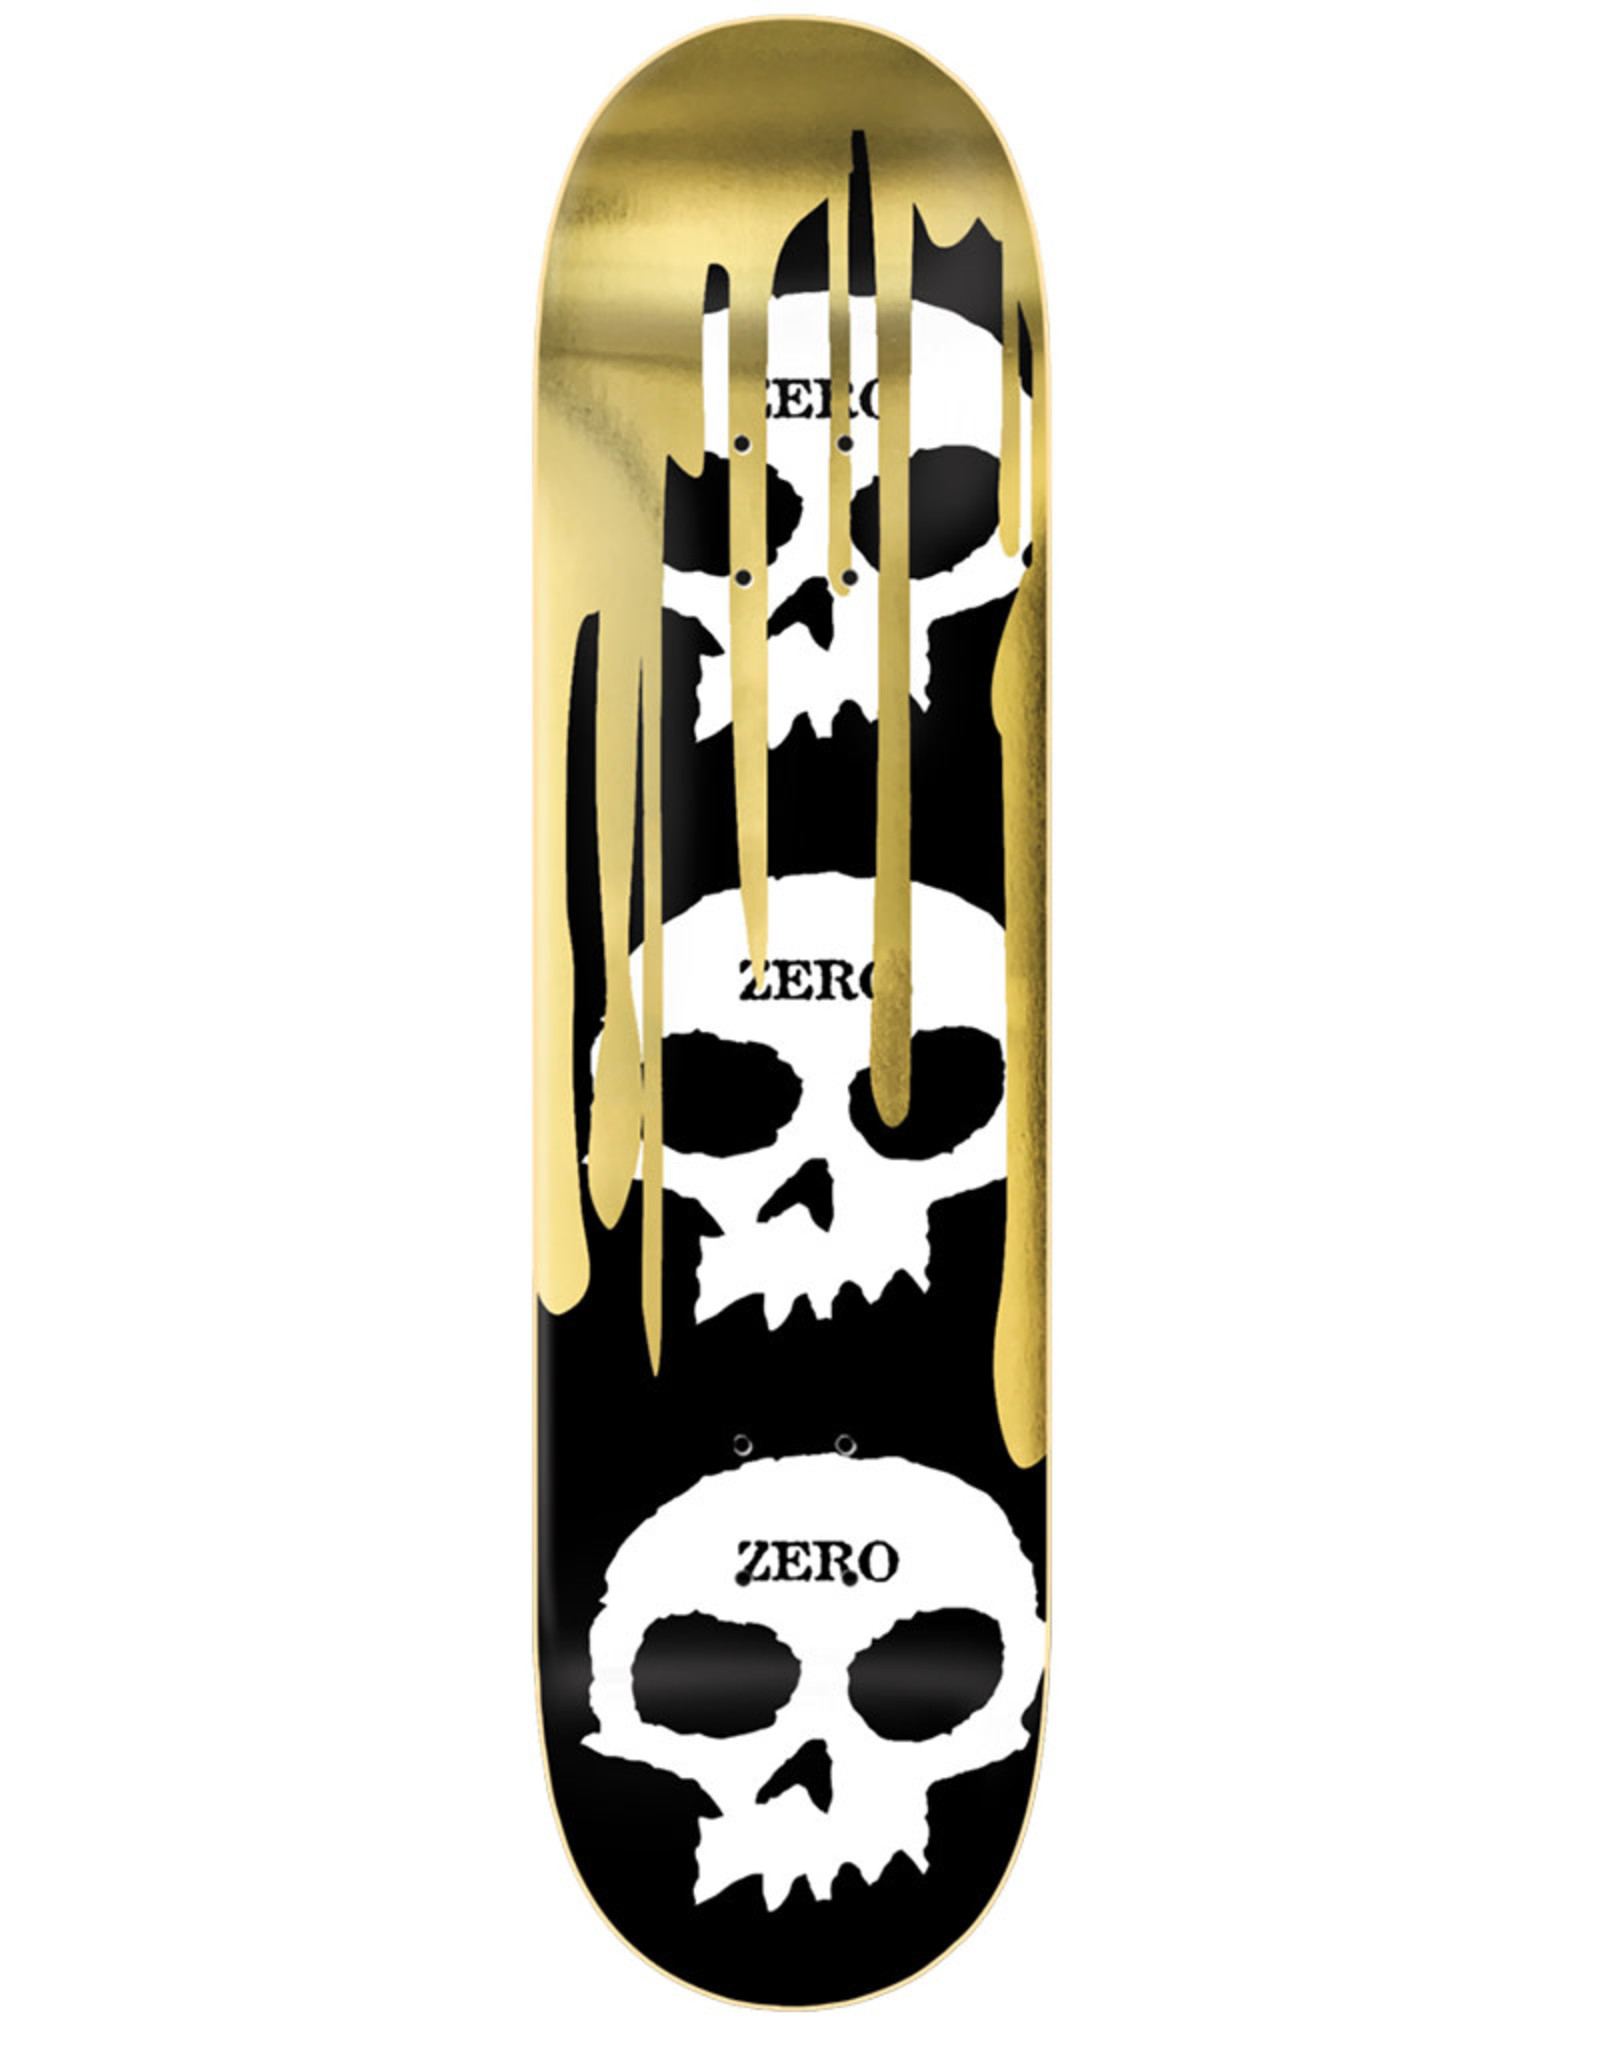 Zero Skateboards Zero Deck Team 3 Skull Blood Gold Foil (8.25)